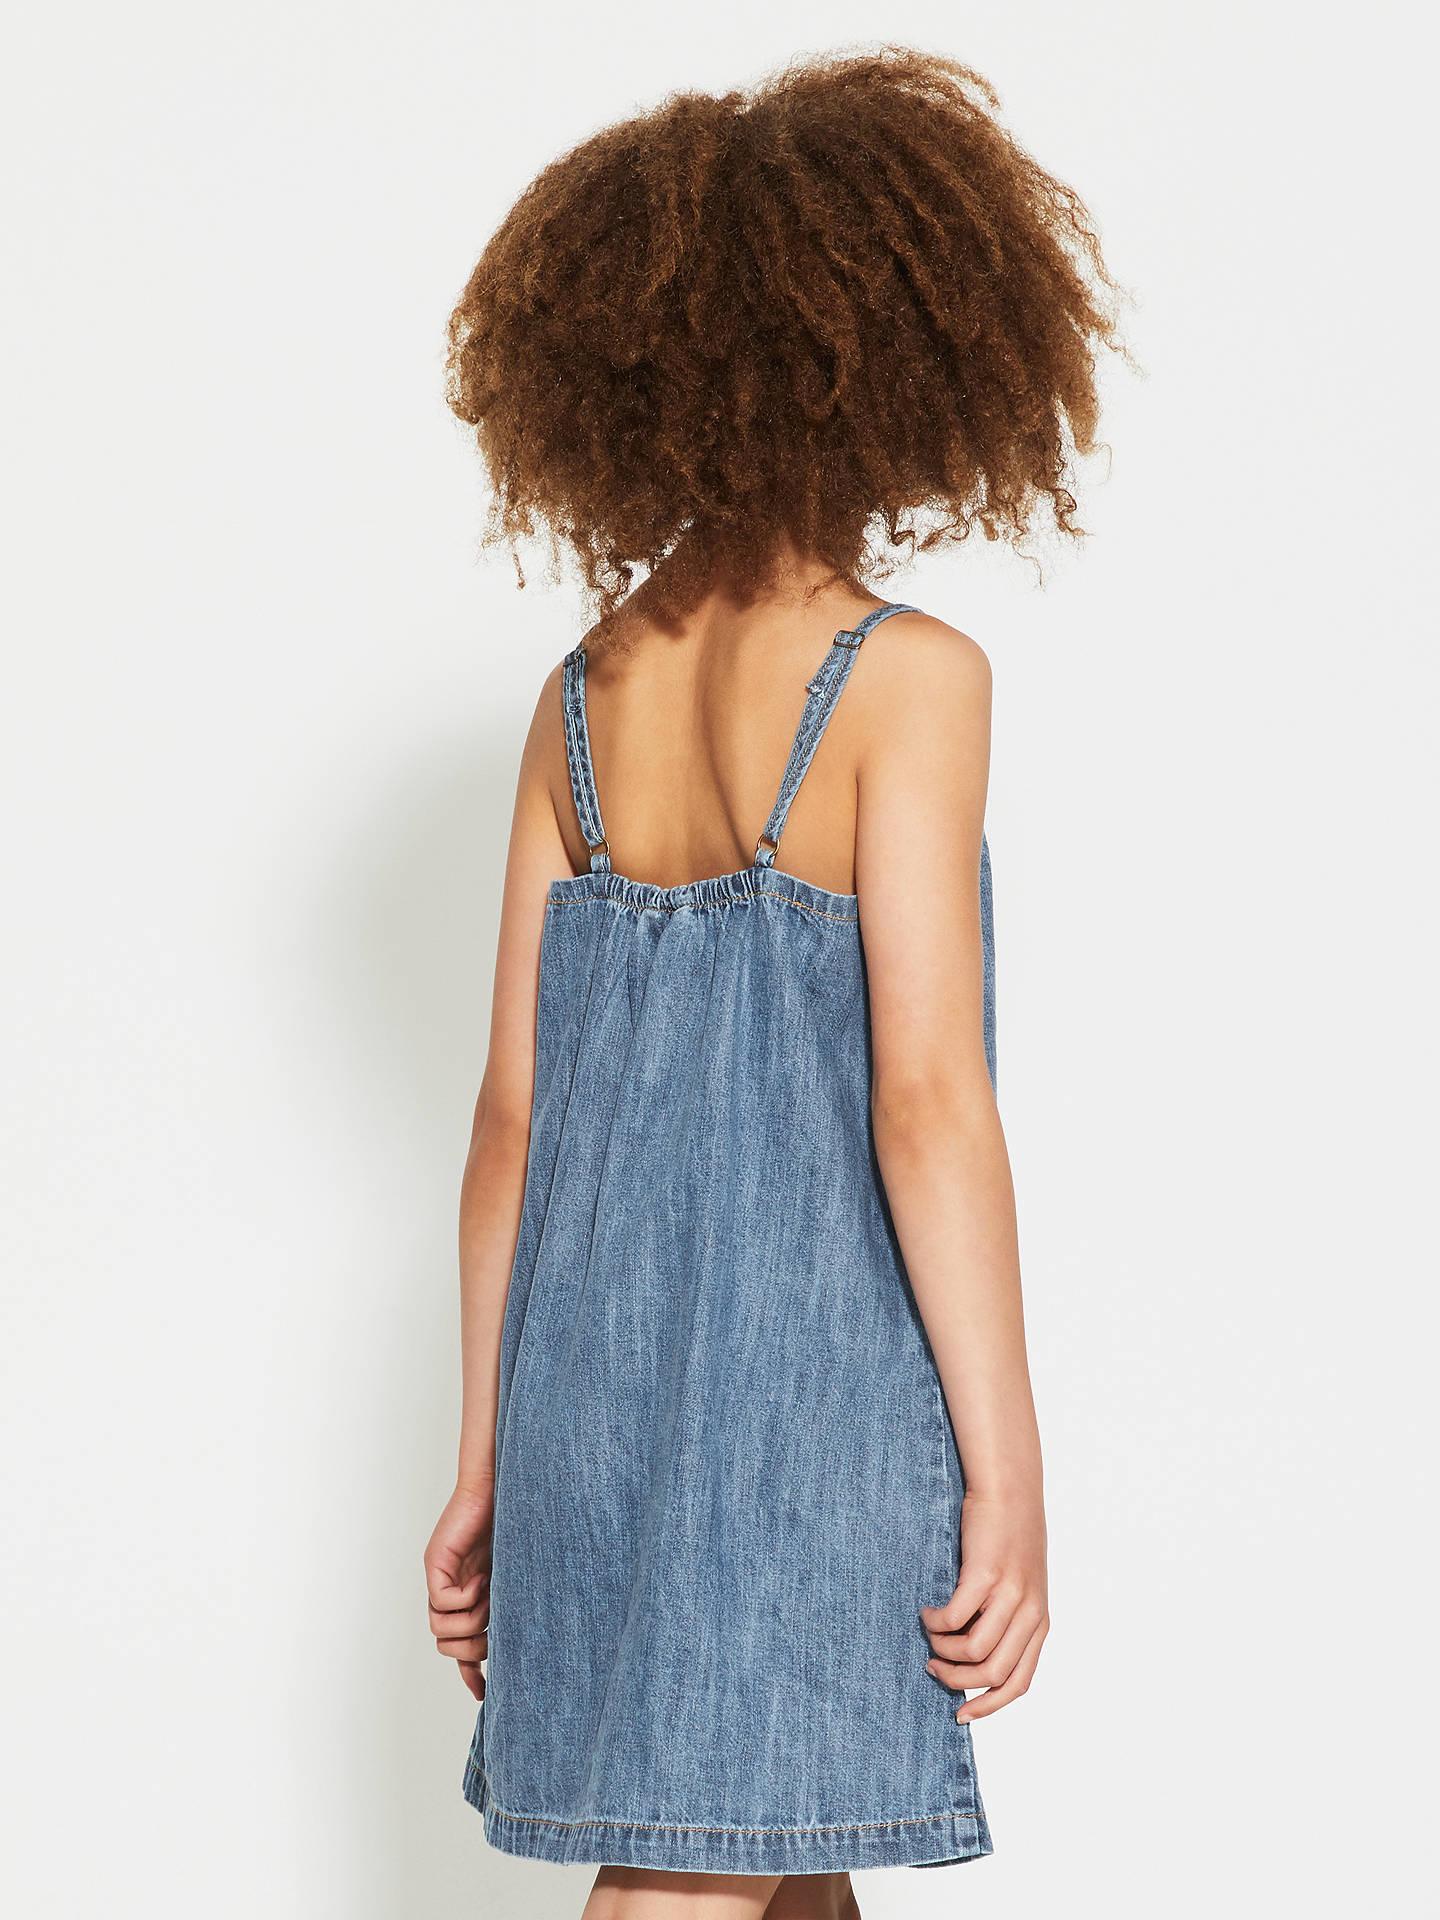 8a251747039b ... Buy John Lewis Children's Denim Pinafore Dress, Light Blue, 8 years  Online at johnlewis ...